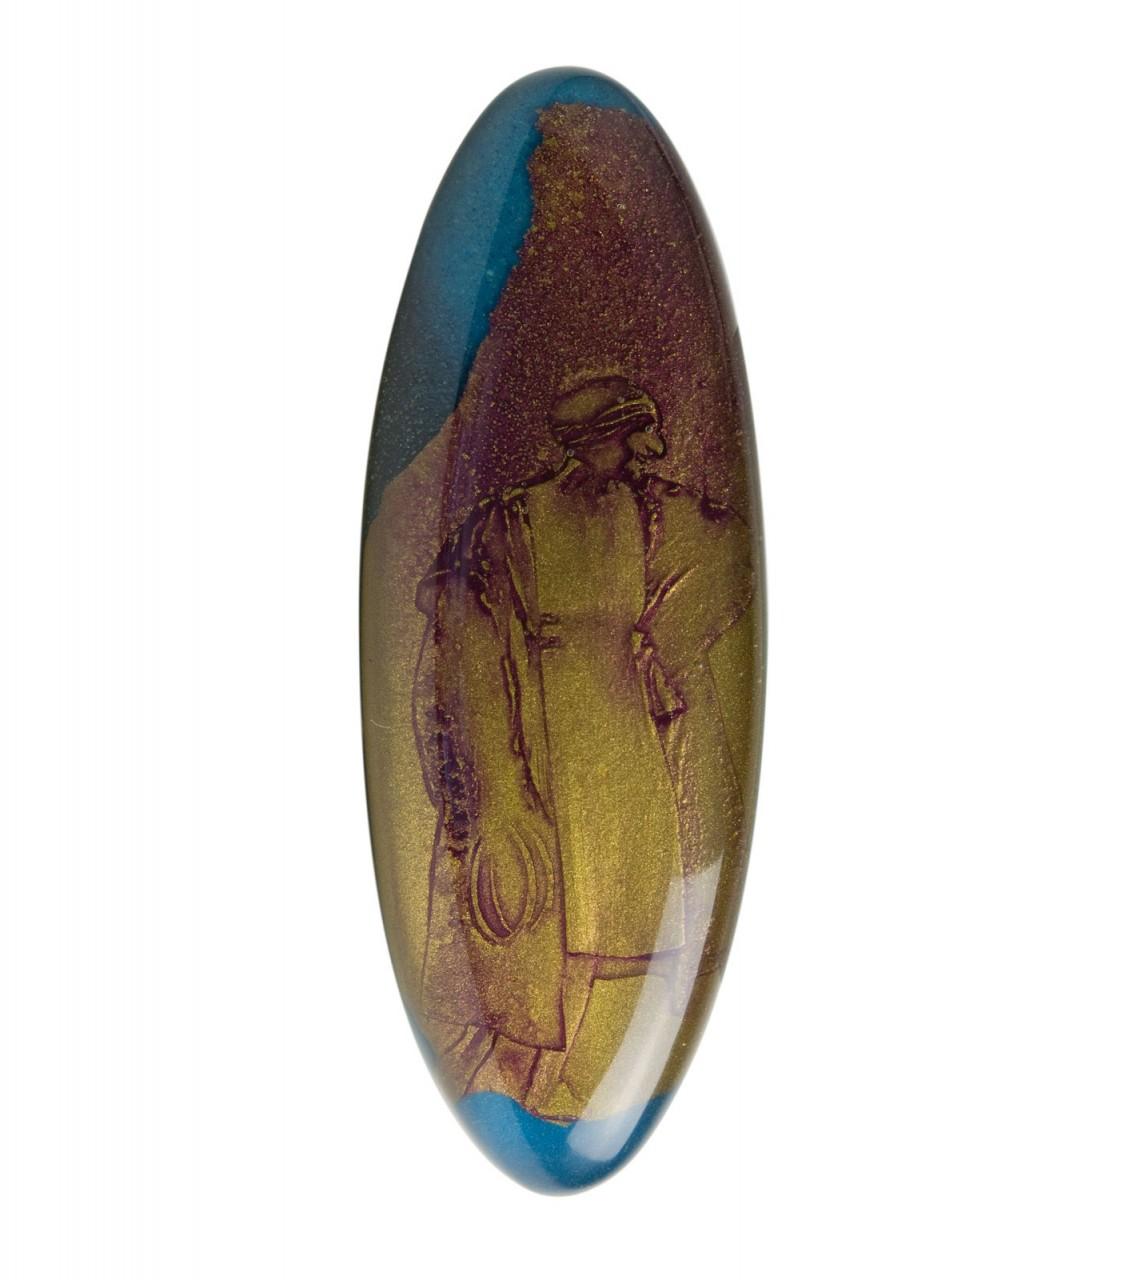 Suzanne viola-oro 2005 - cm 18x6,5 - acrylic, epoxy glazing